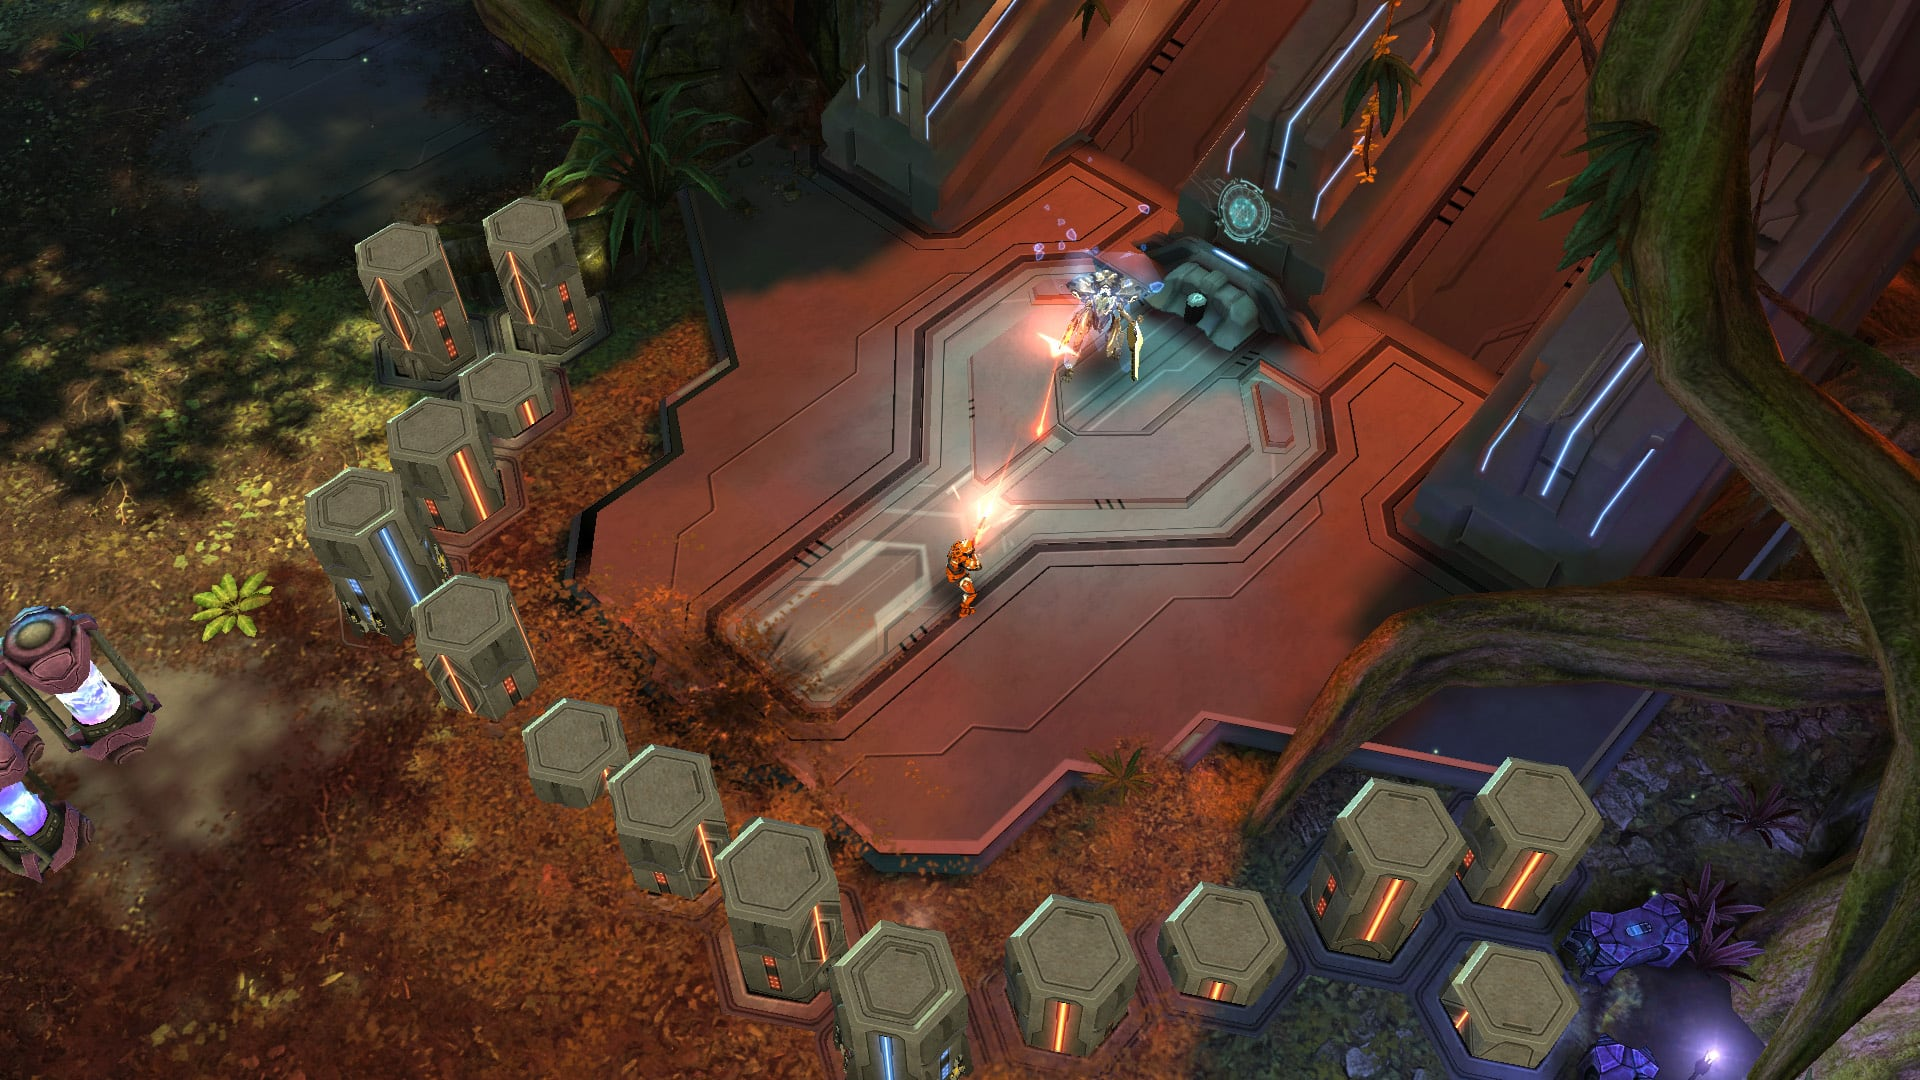 Halo: Spartan Strike for Windows 10